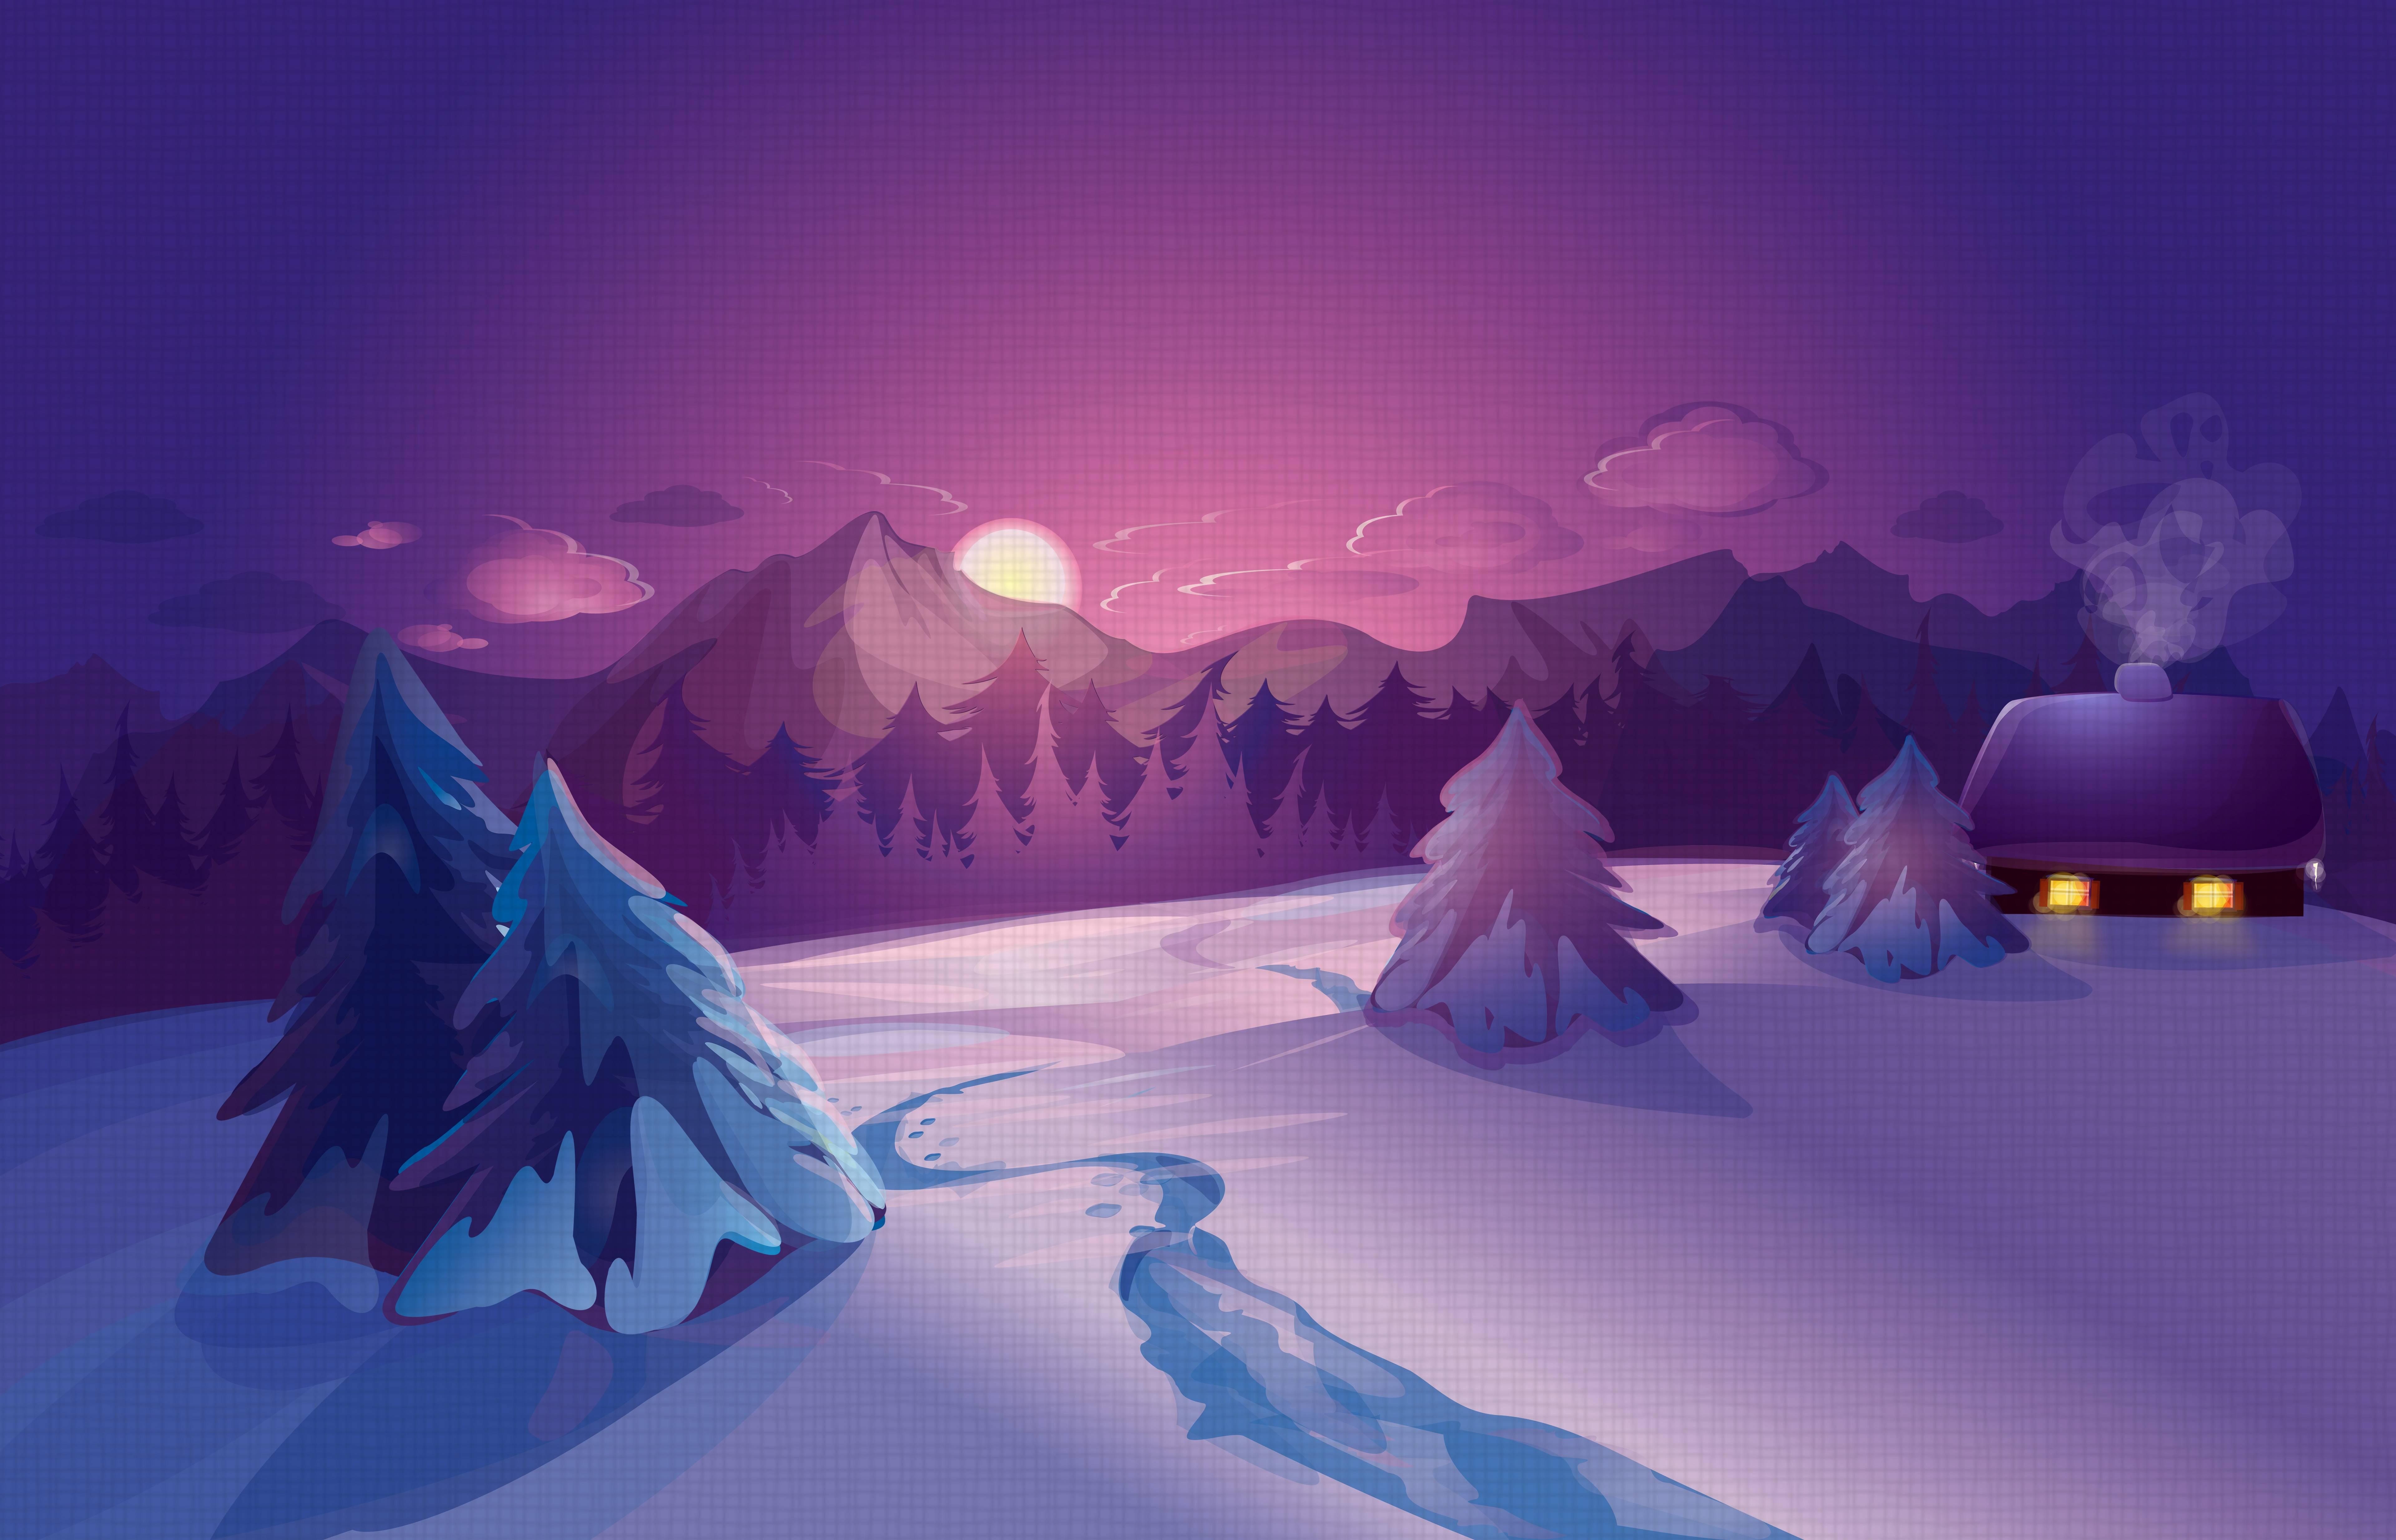 графика горы скалы снег зима рисунок graphics mountains rock snow winter figure загрузить